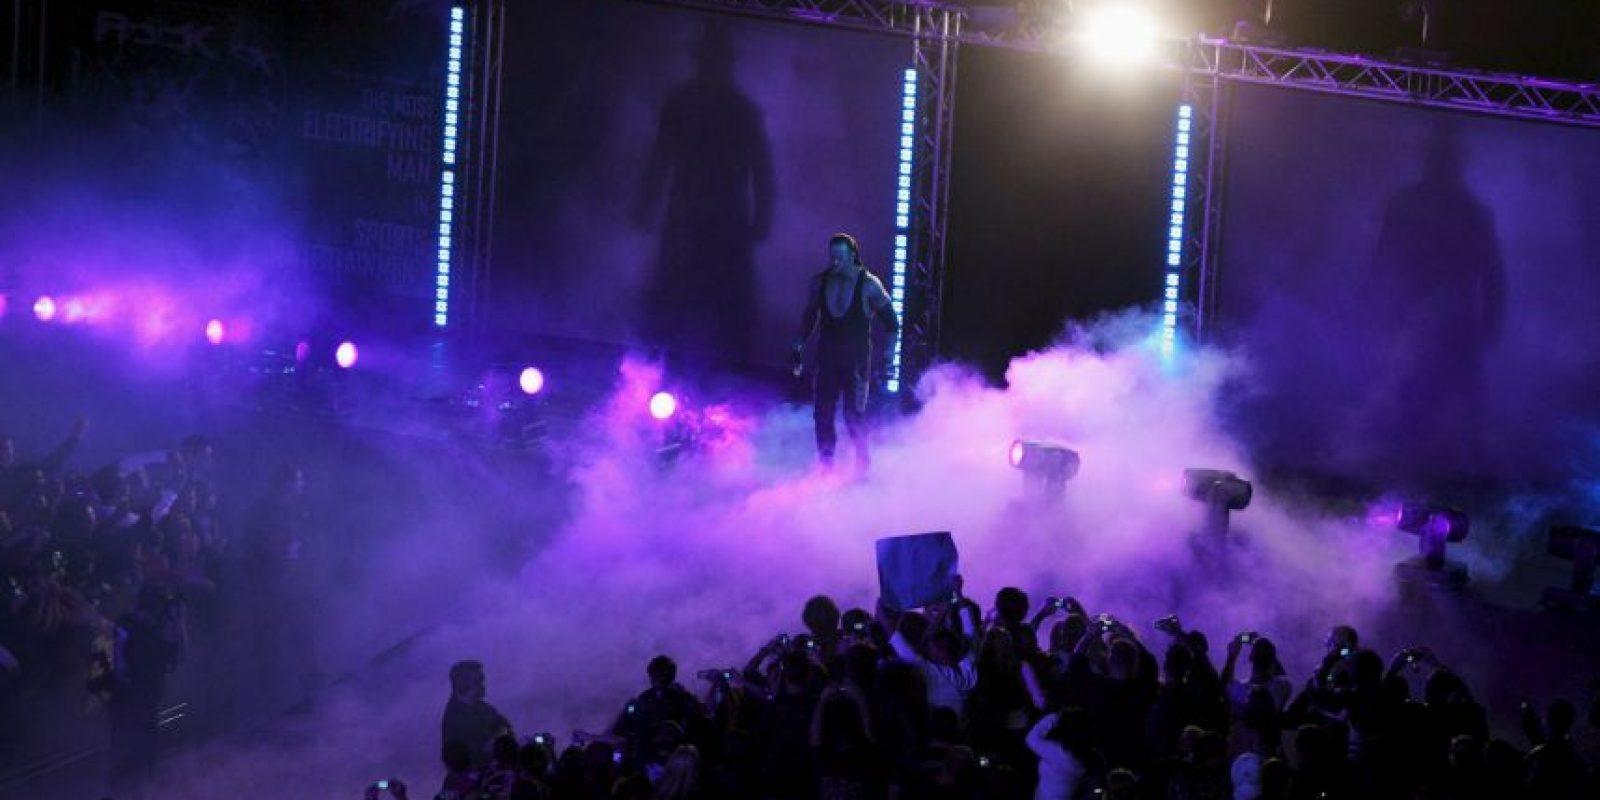 Foto:Se espera que Undertaker regrese en Wrestlemania 33